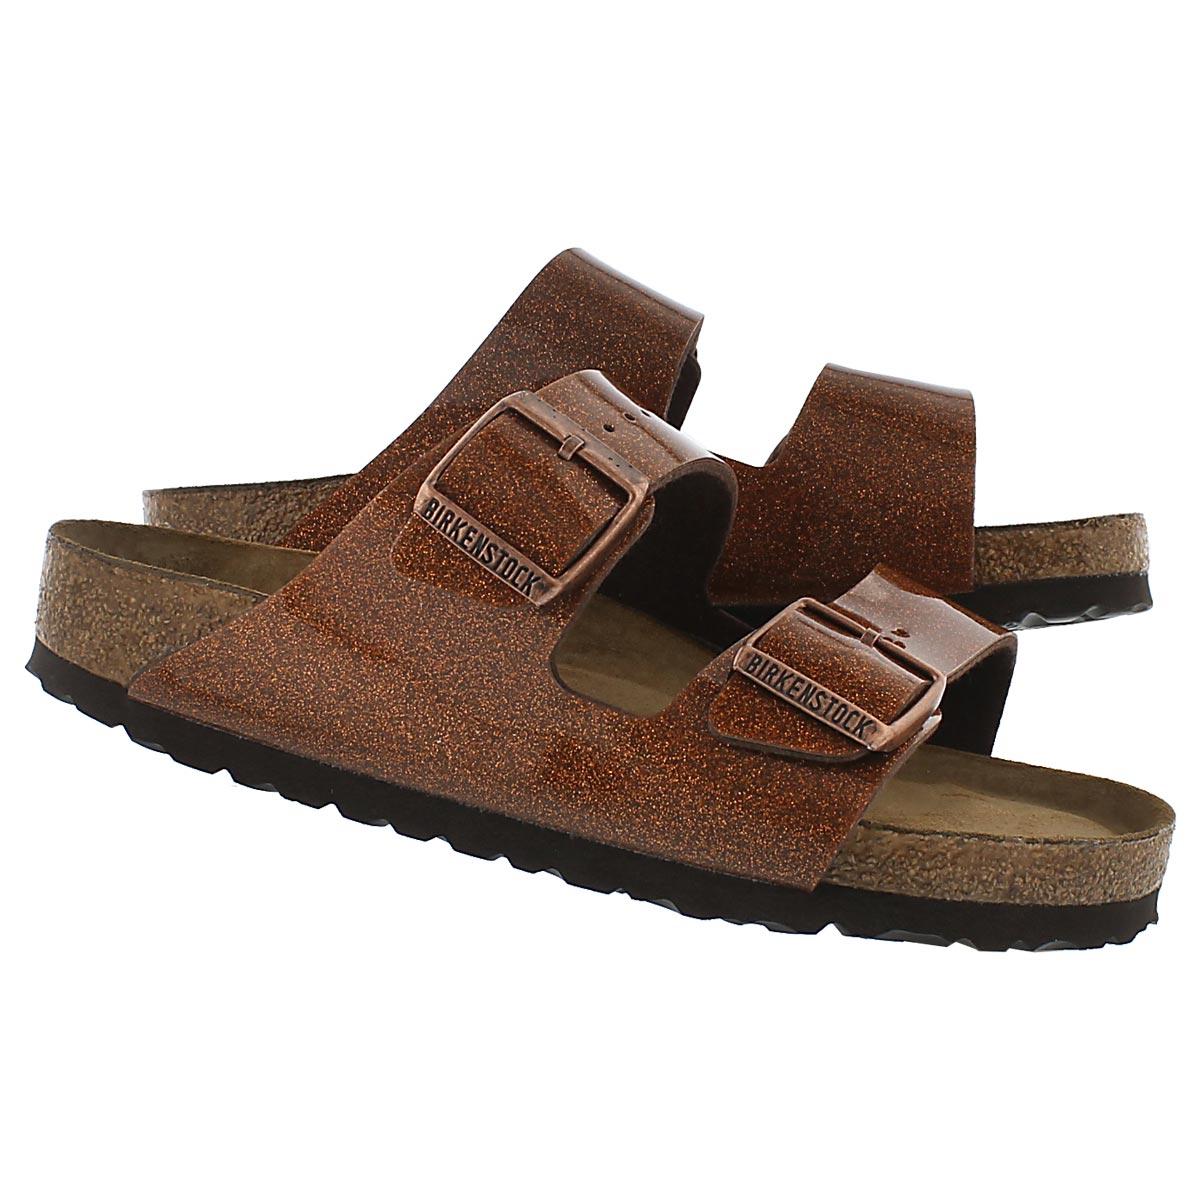 Lds Arizona SF magic galaxy brz sandal